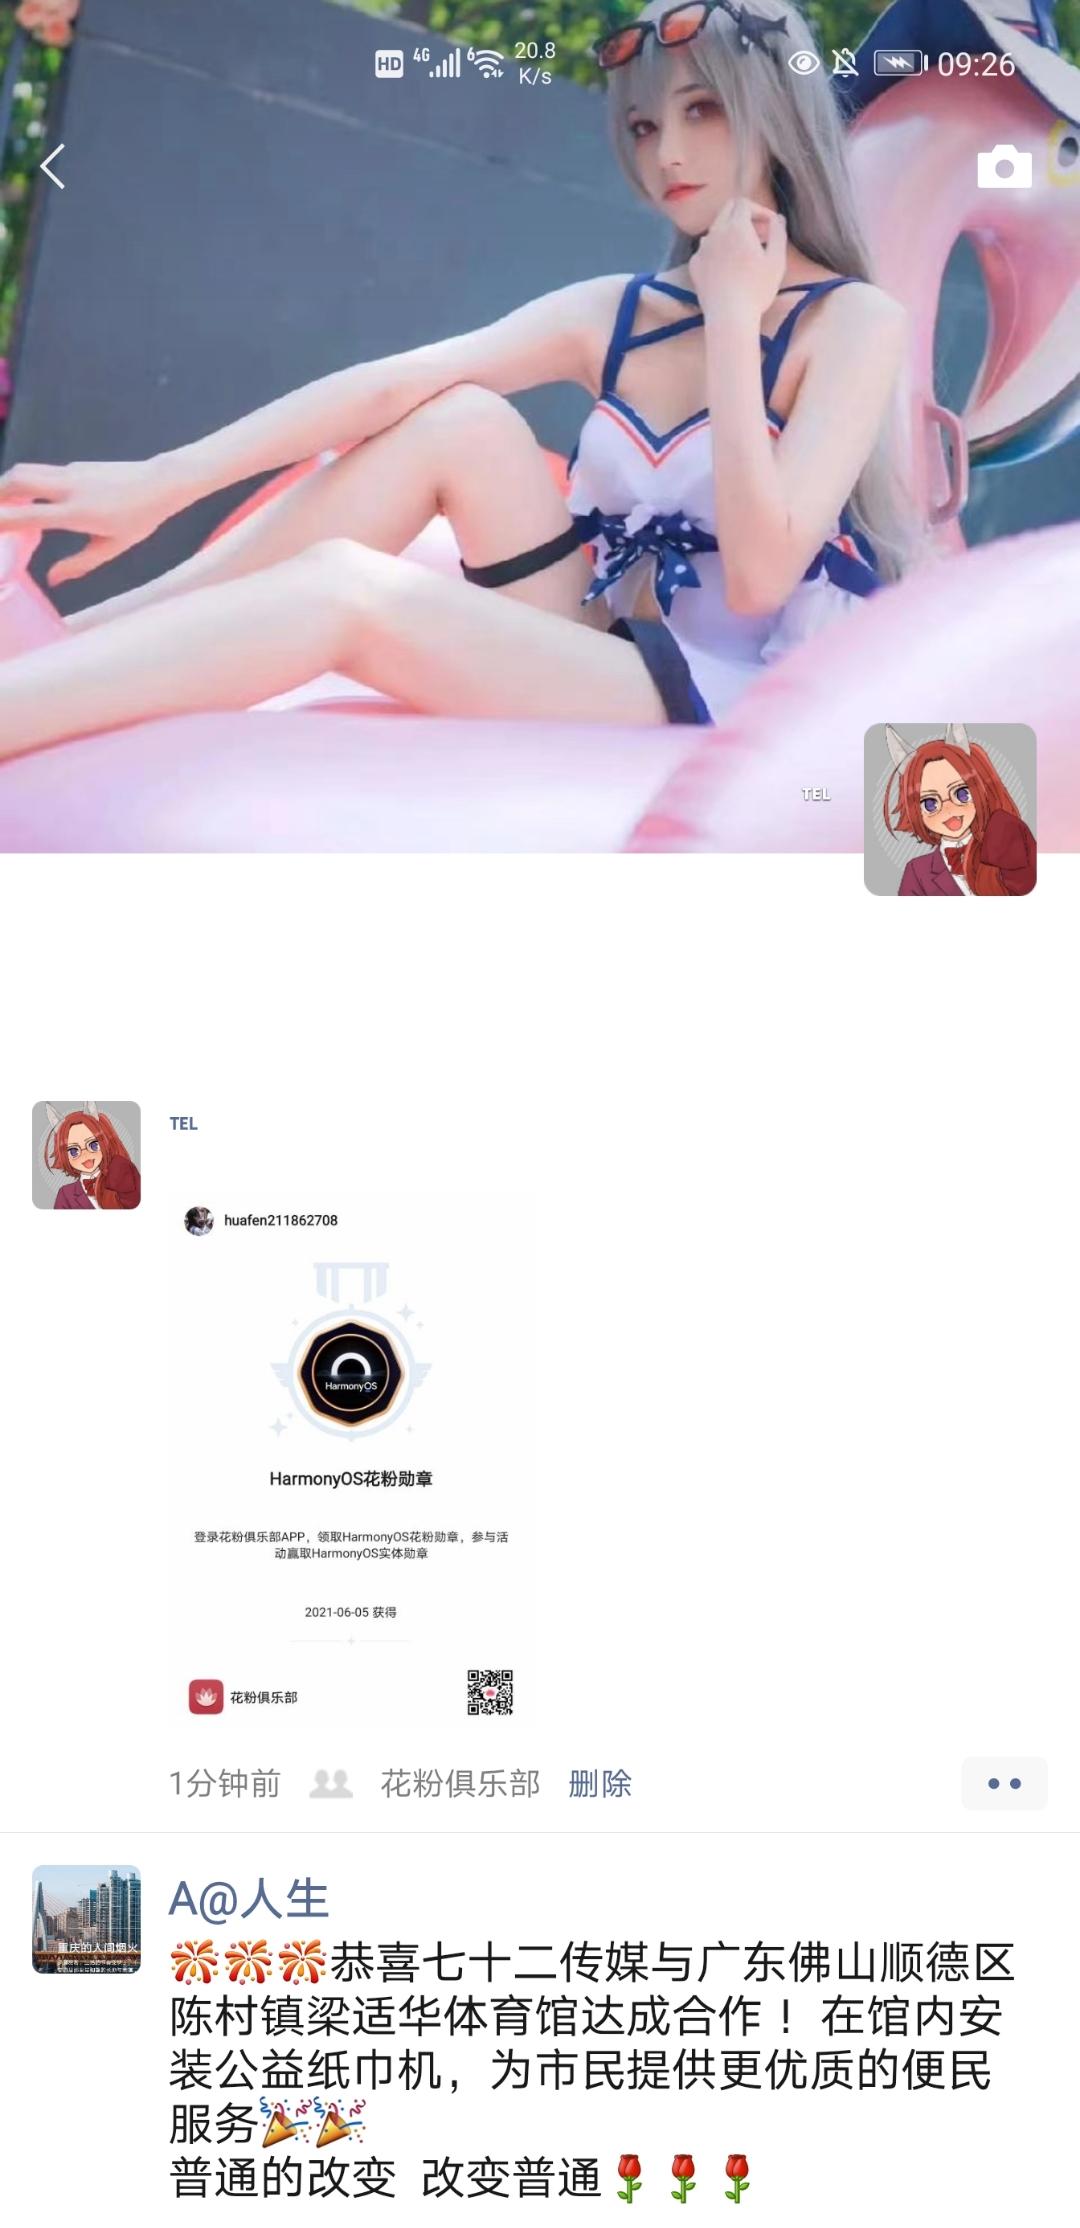 Screenshot_20210612_092641_com.tencent.mm.jpg